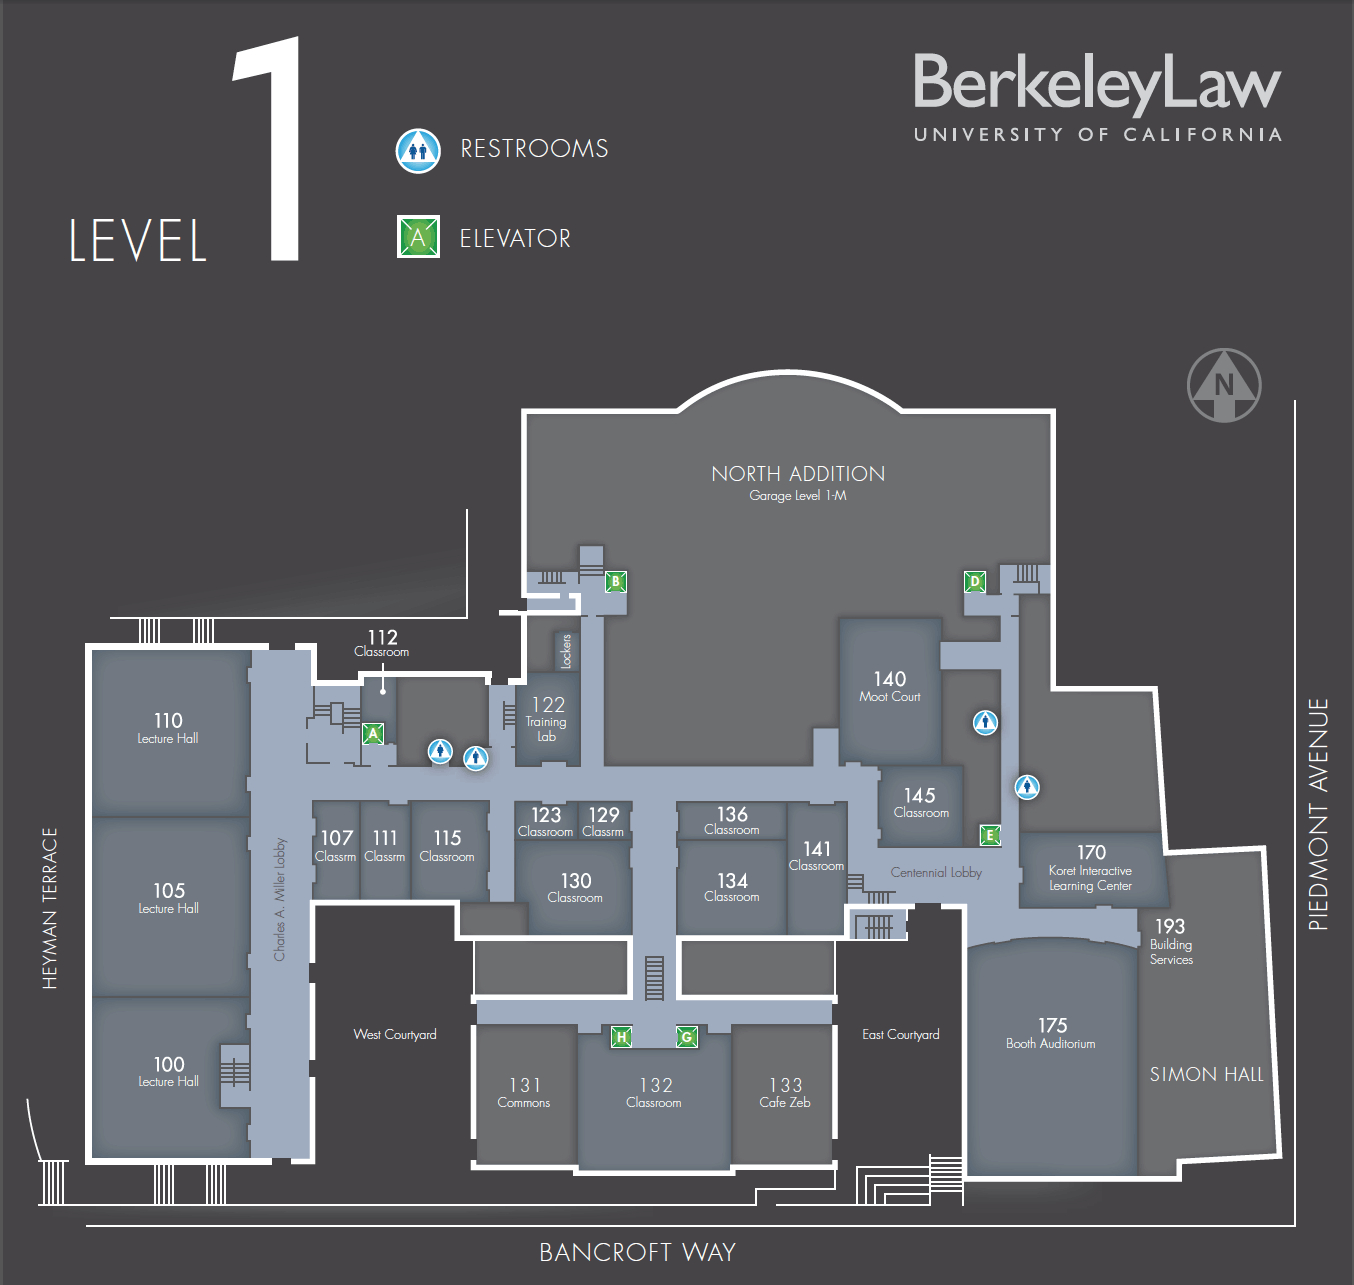 Map Of Boalt | Berkeley Law intended for Berkeley Law Academic Calendar